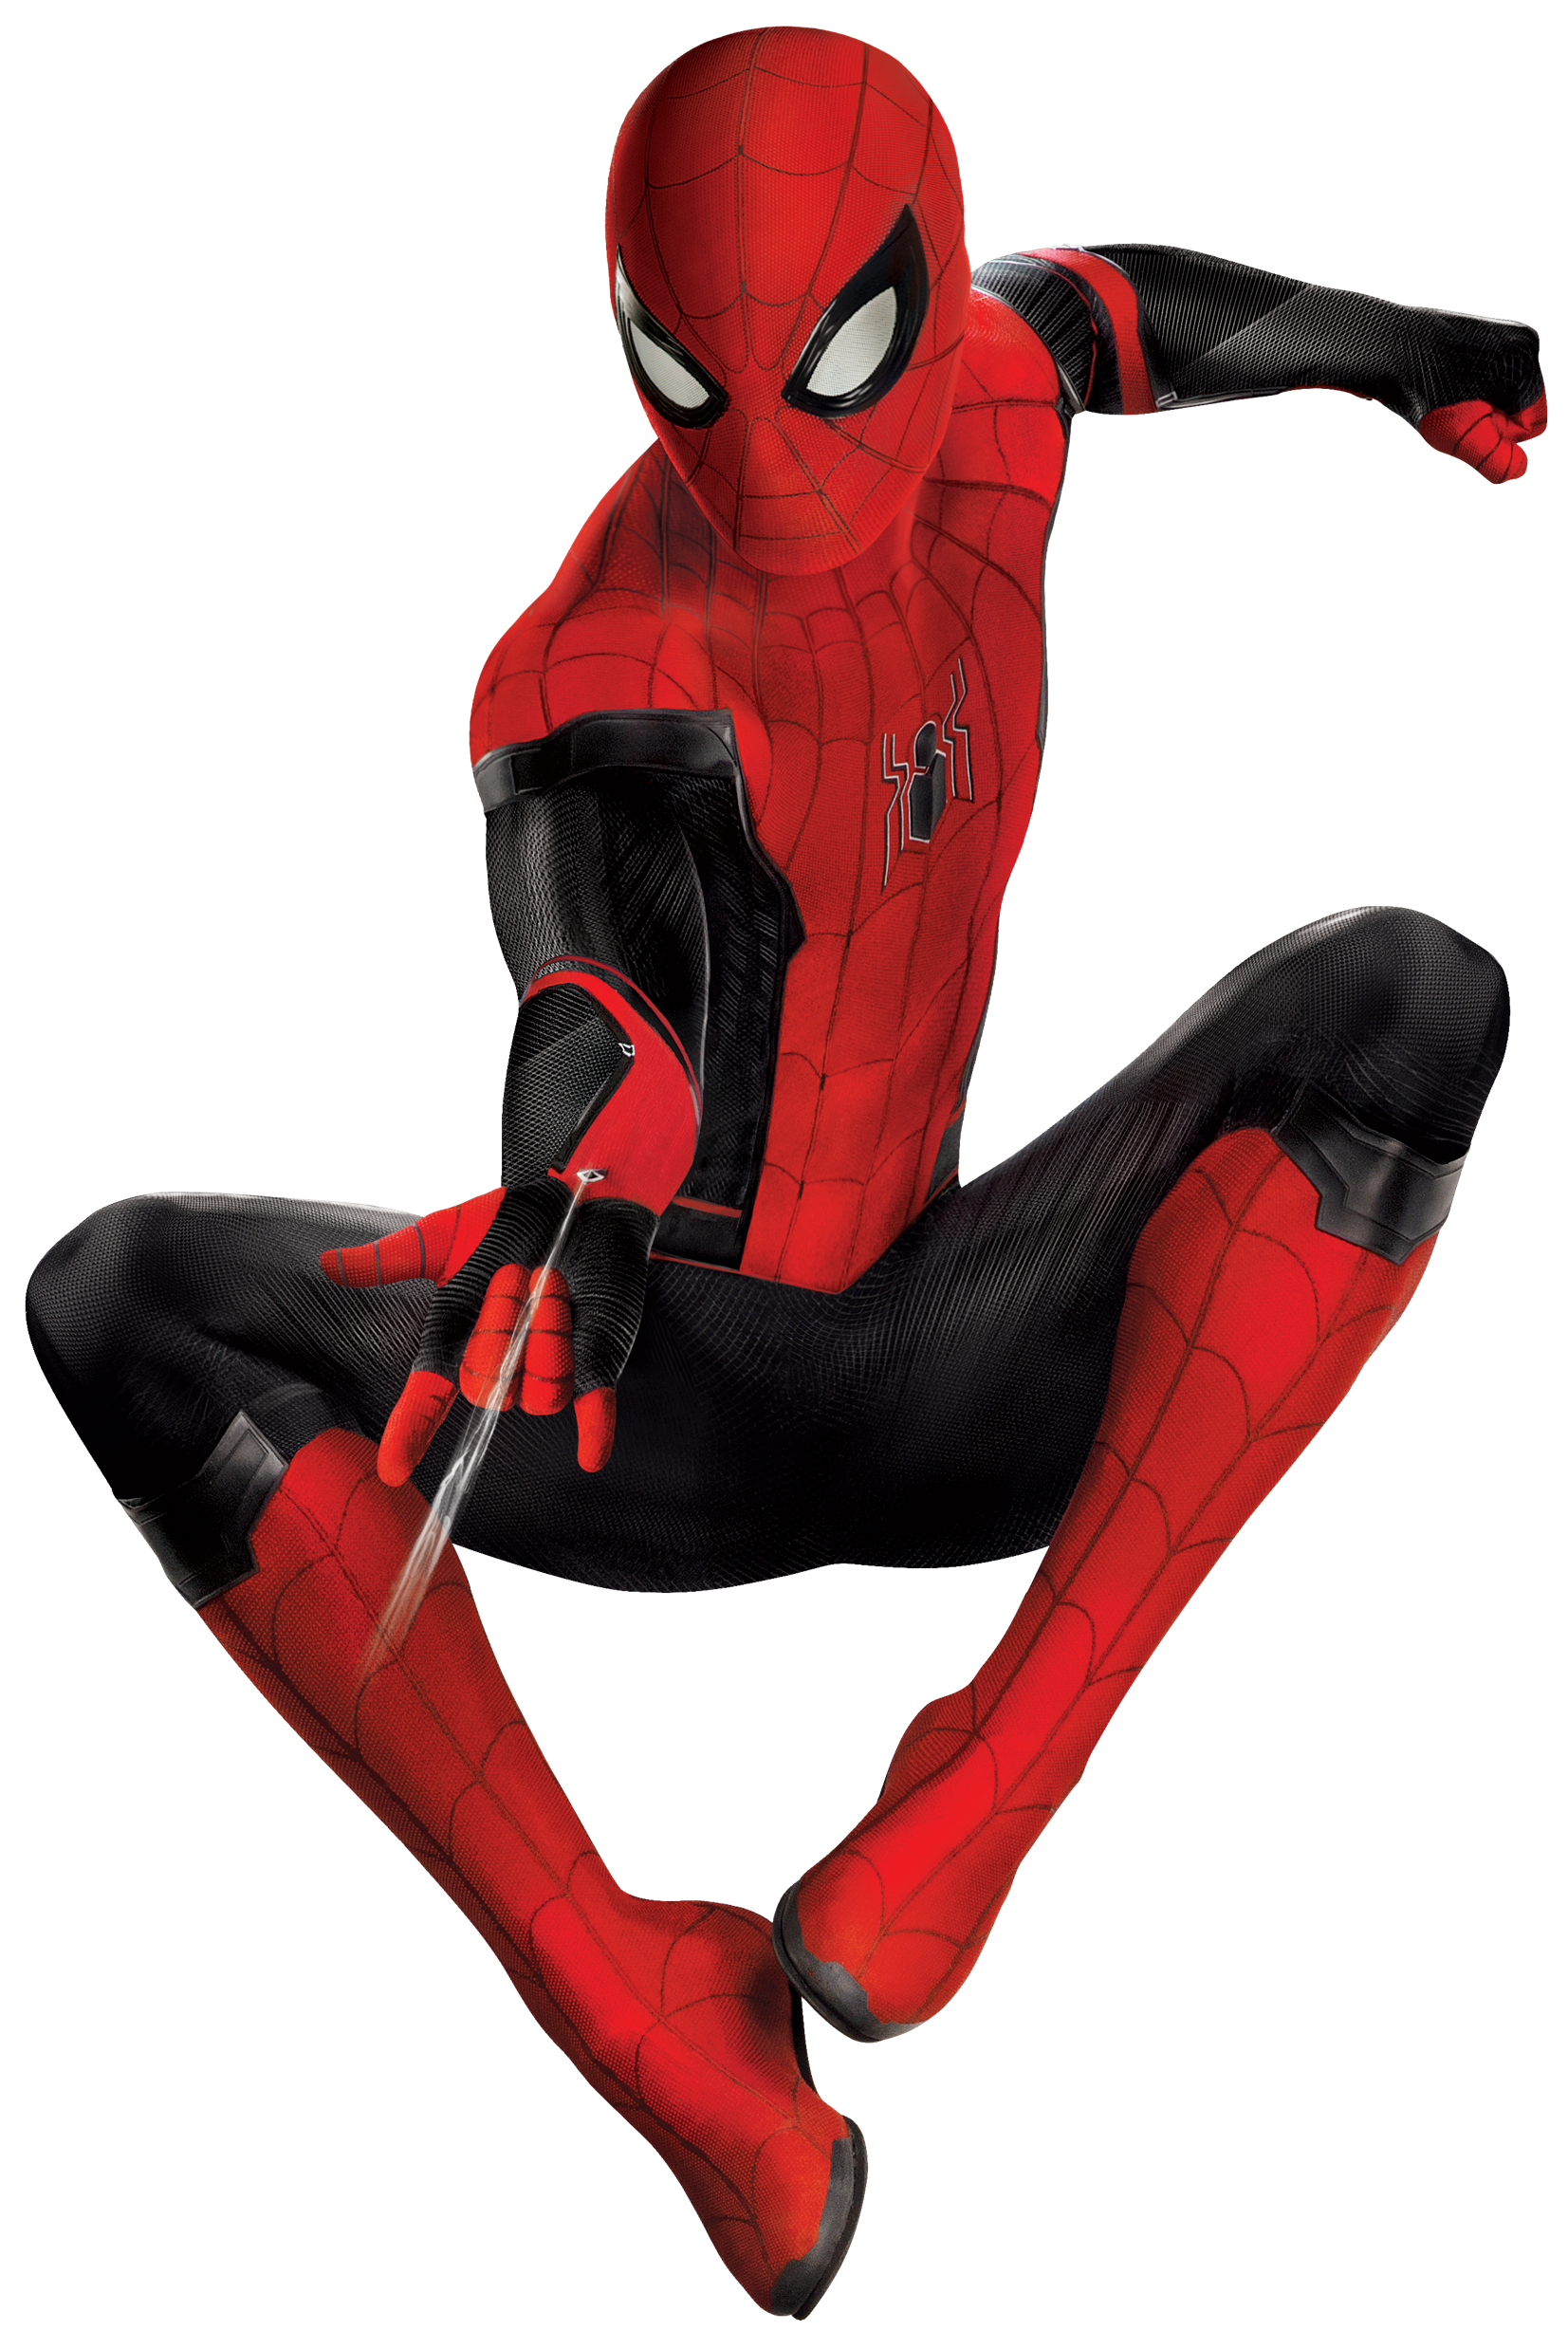 Spider Man Suit Marvel Cinematic Universe Wiki Fandom